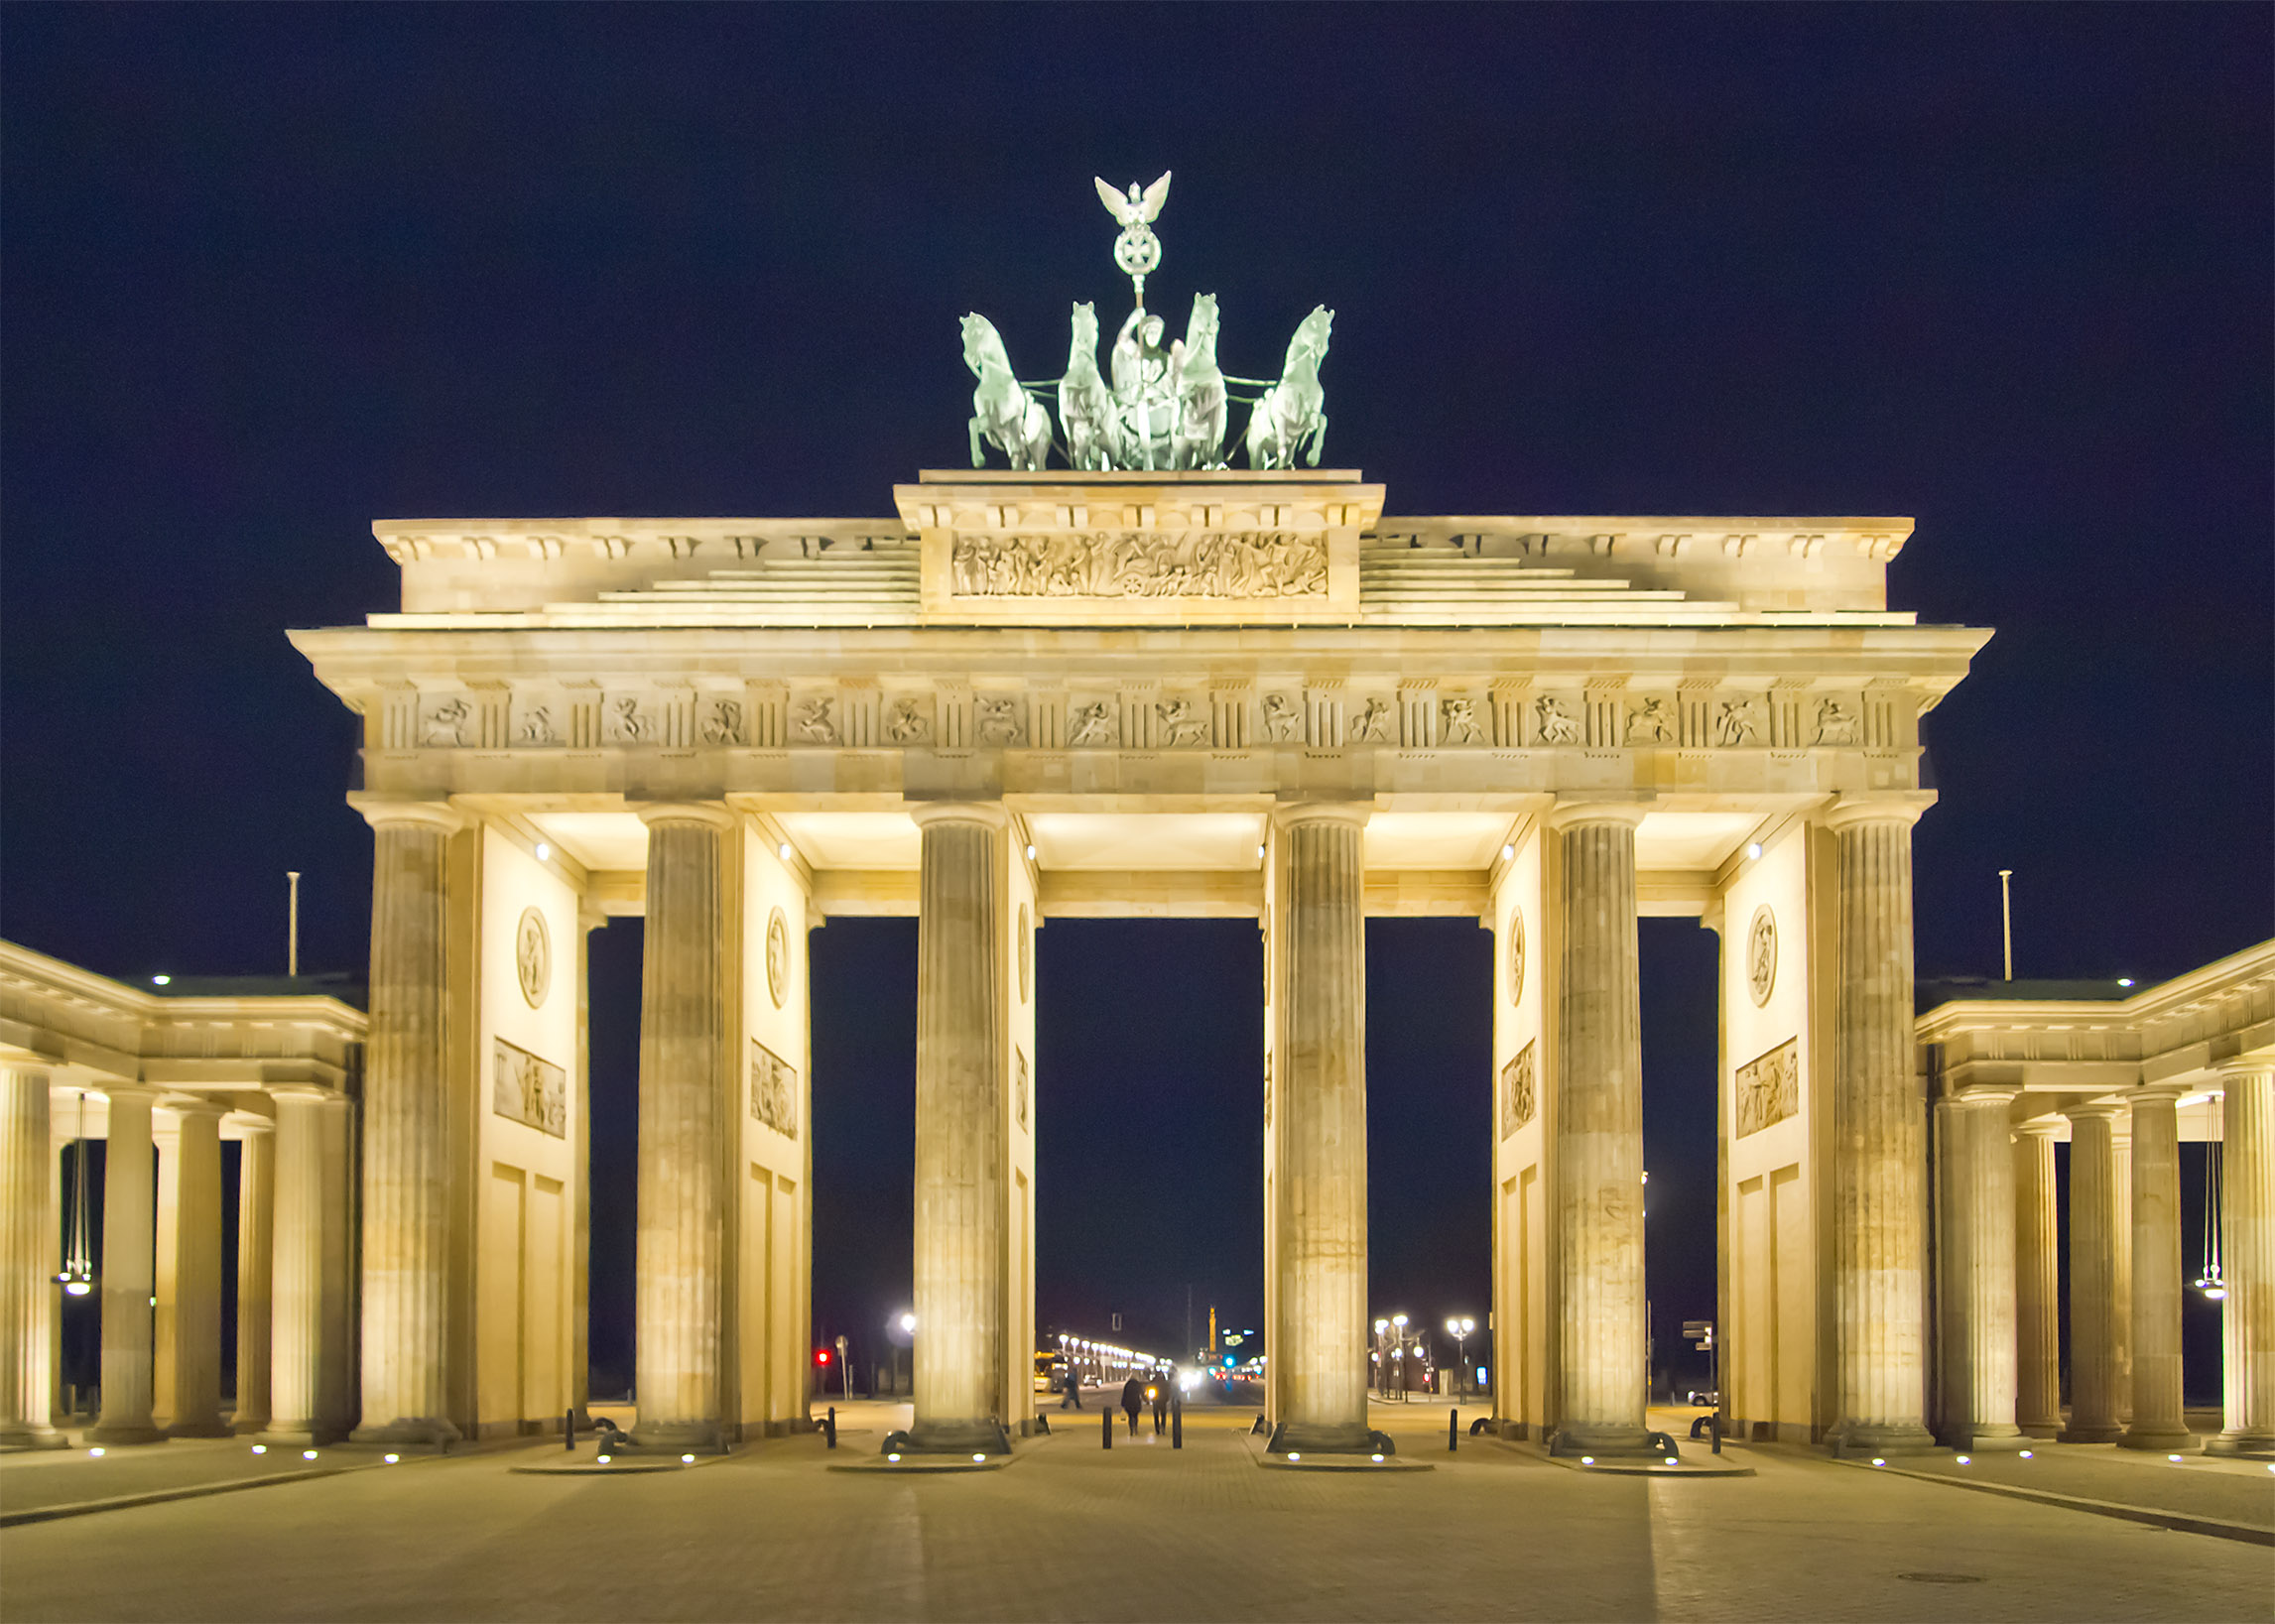 Fileberlin Brandenburger Tor Nachtjpg Wikimedia Commons